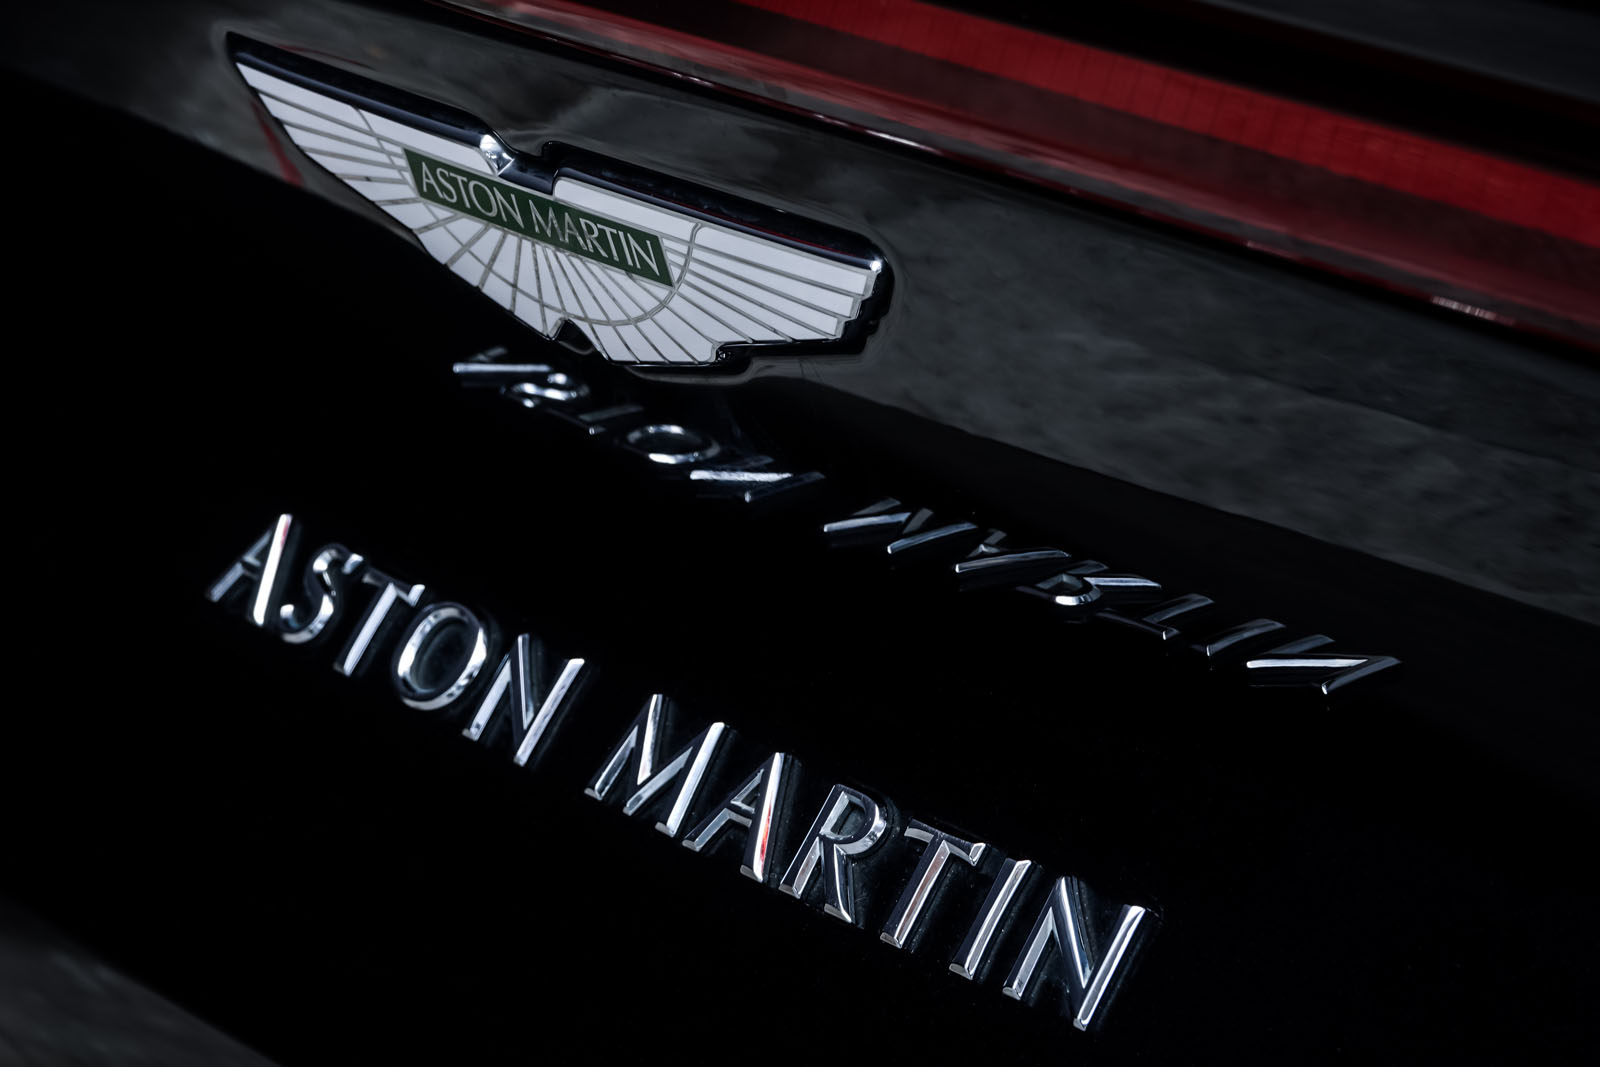 AstonMartin_V8_Vantage_Schwarz_Schwarz_AM-1849_20_w